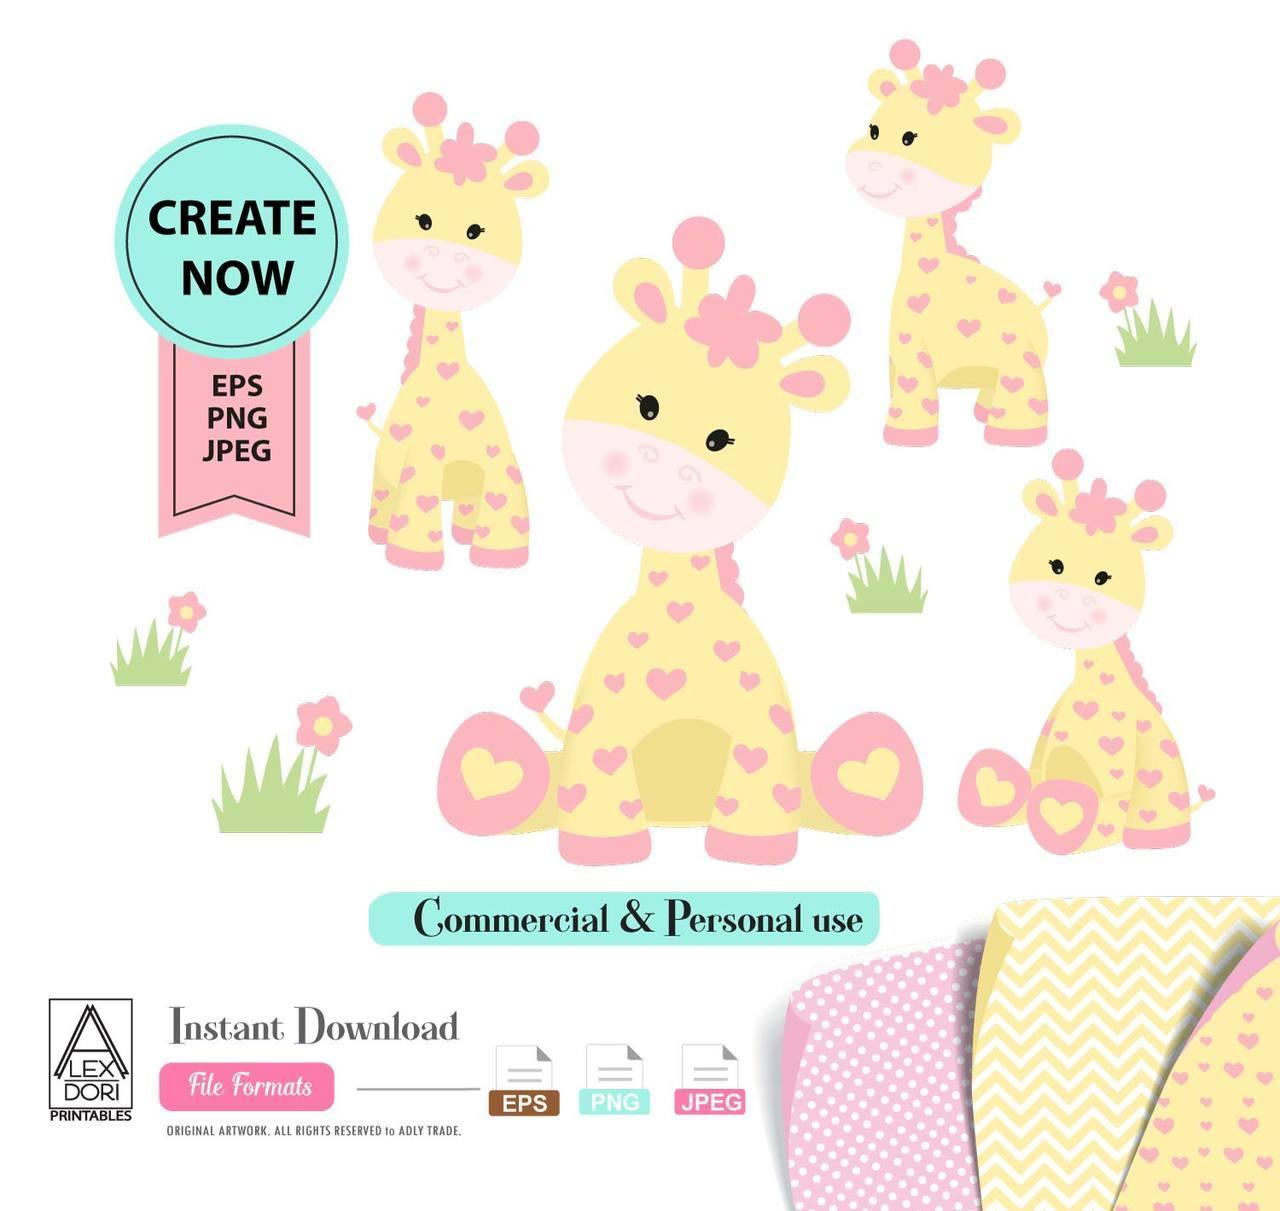 Girl Giraffe Clip art, Yellow baby giraffe with pink hearts for baby  shower, nursery wall art, shower decoration, t.